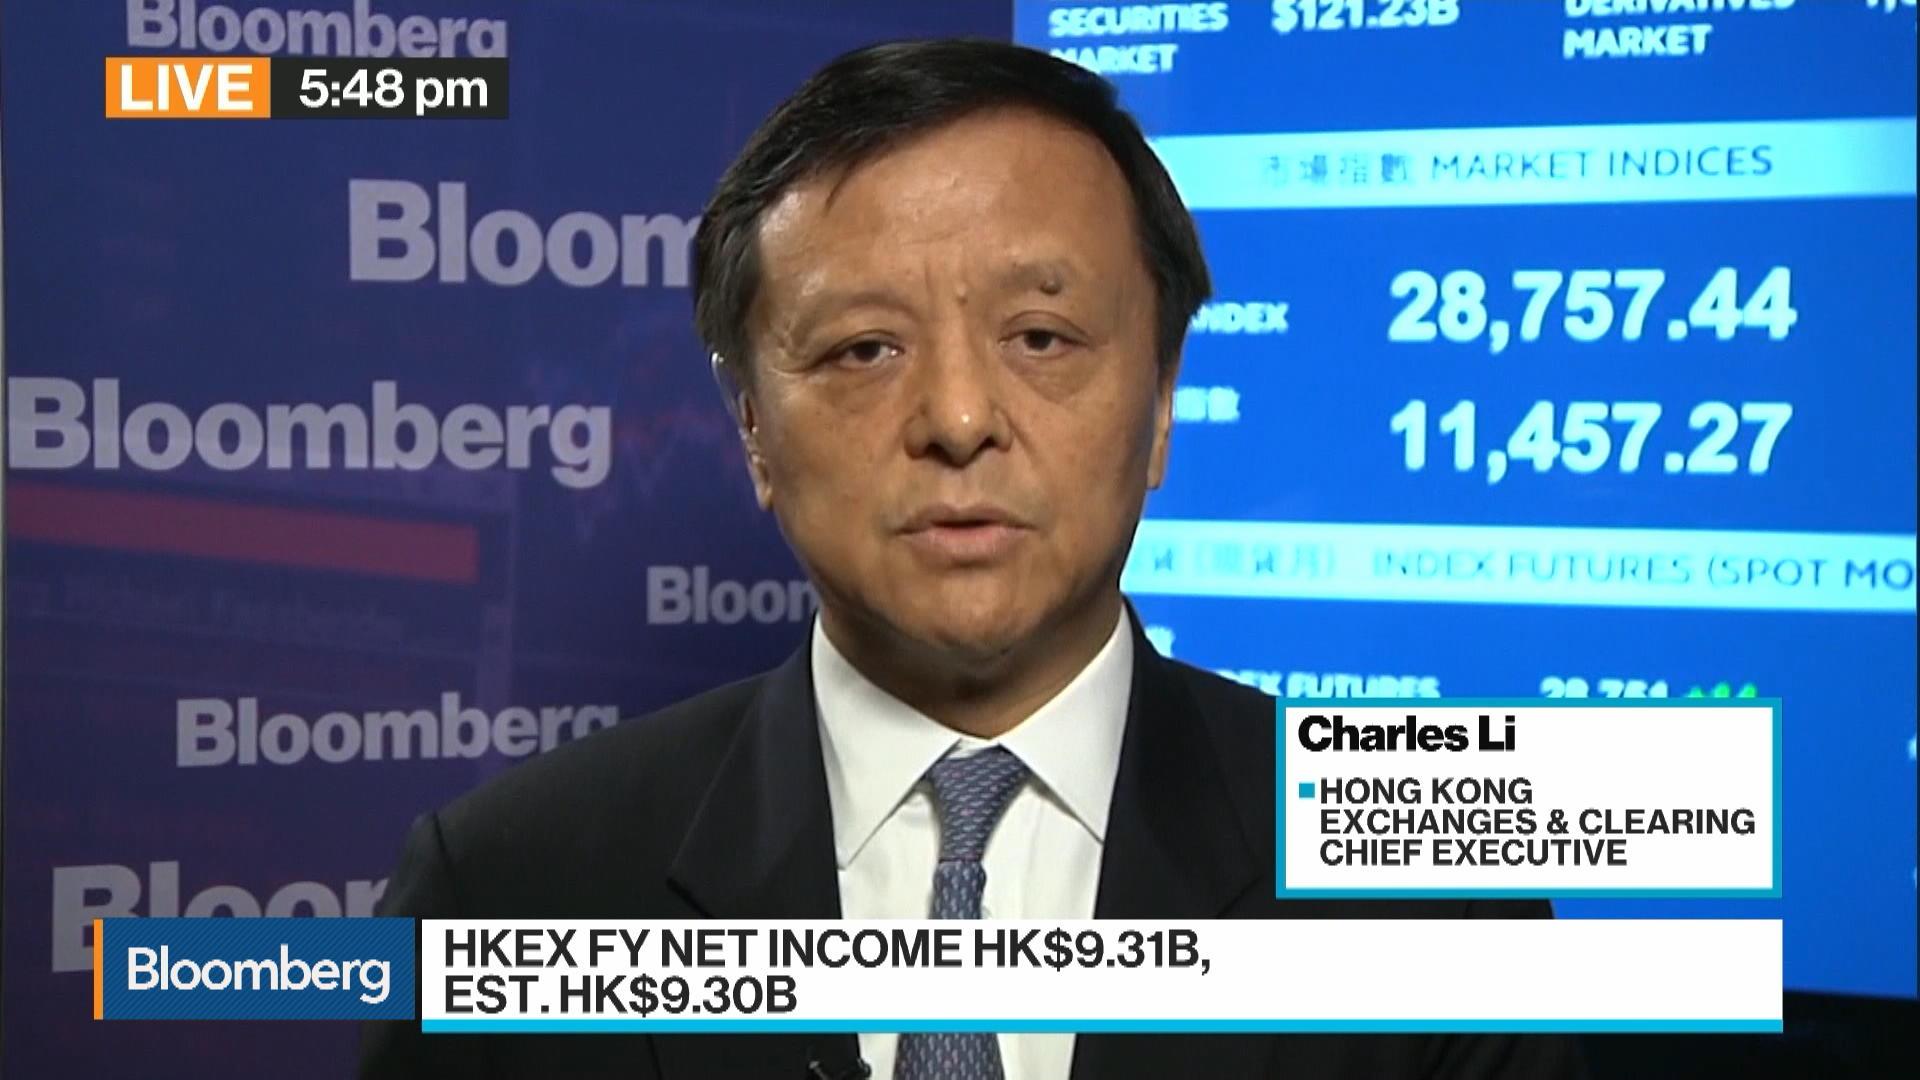 388:Hong Kong Stock Quote - Hong Kong Exchanges & Clearing